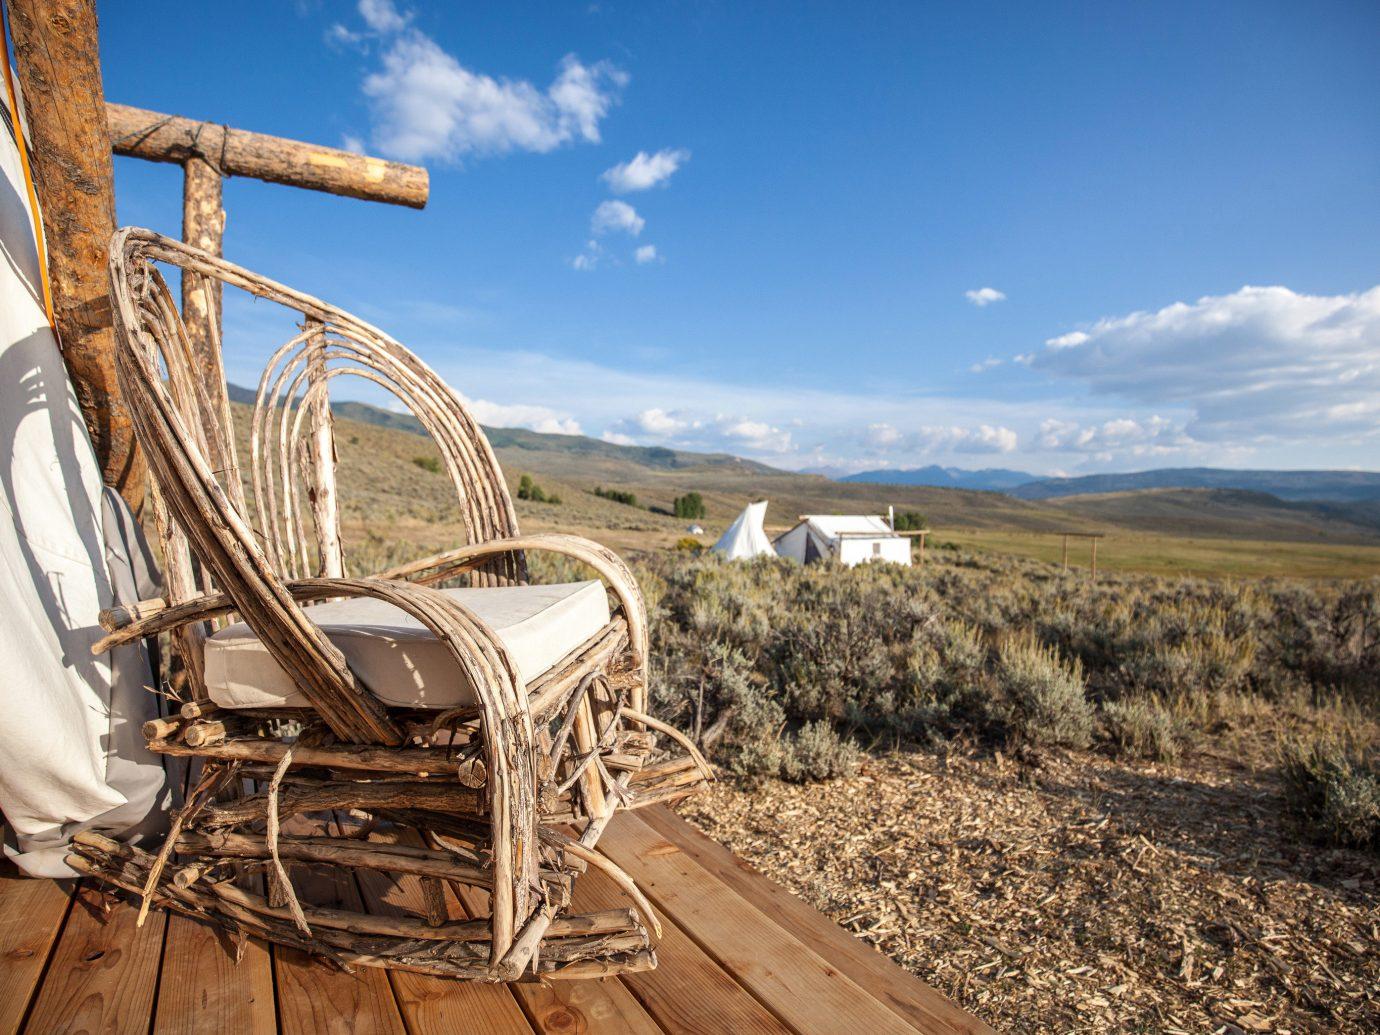 Glamping Outdoors + Adventure Weekend Getaways sky outdoor rural area vehicle agriculture